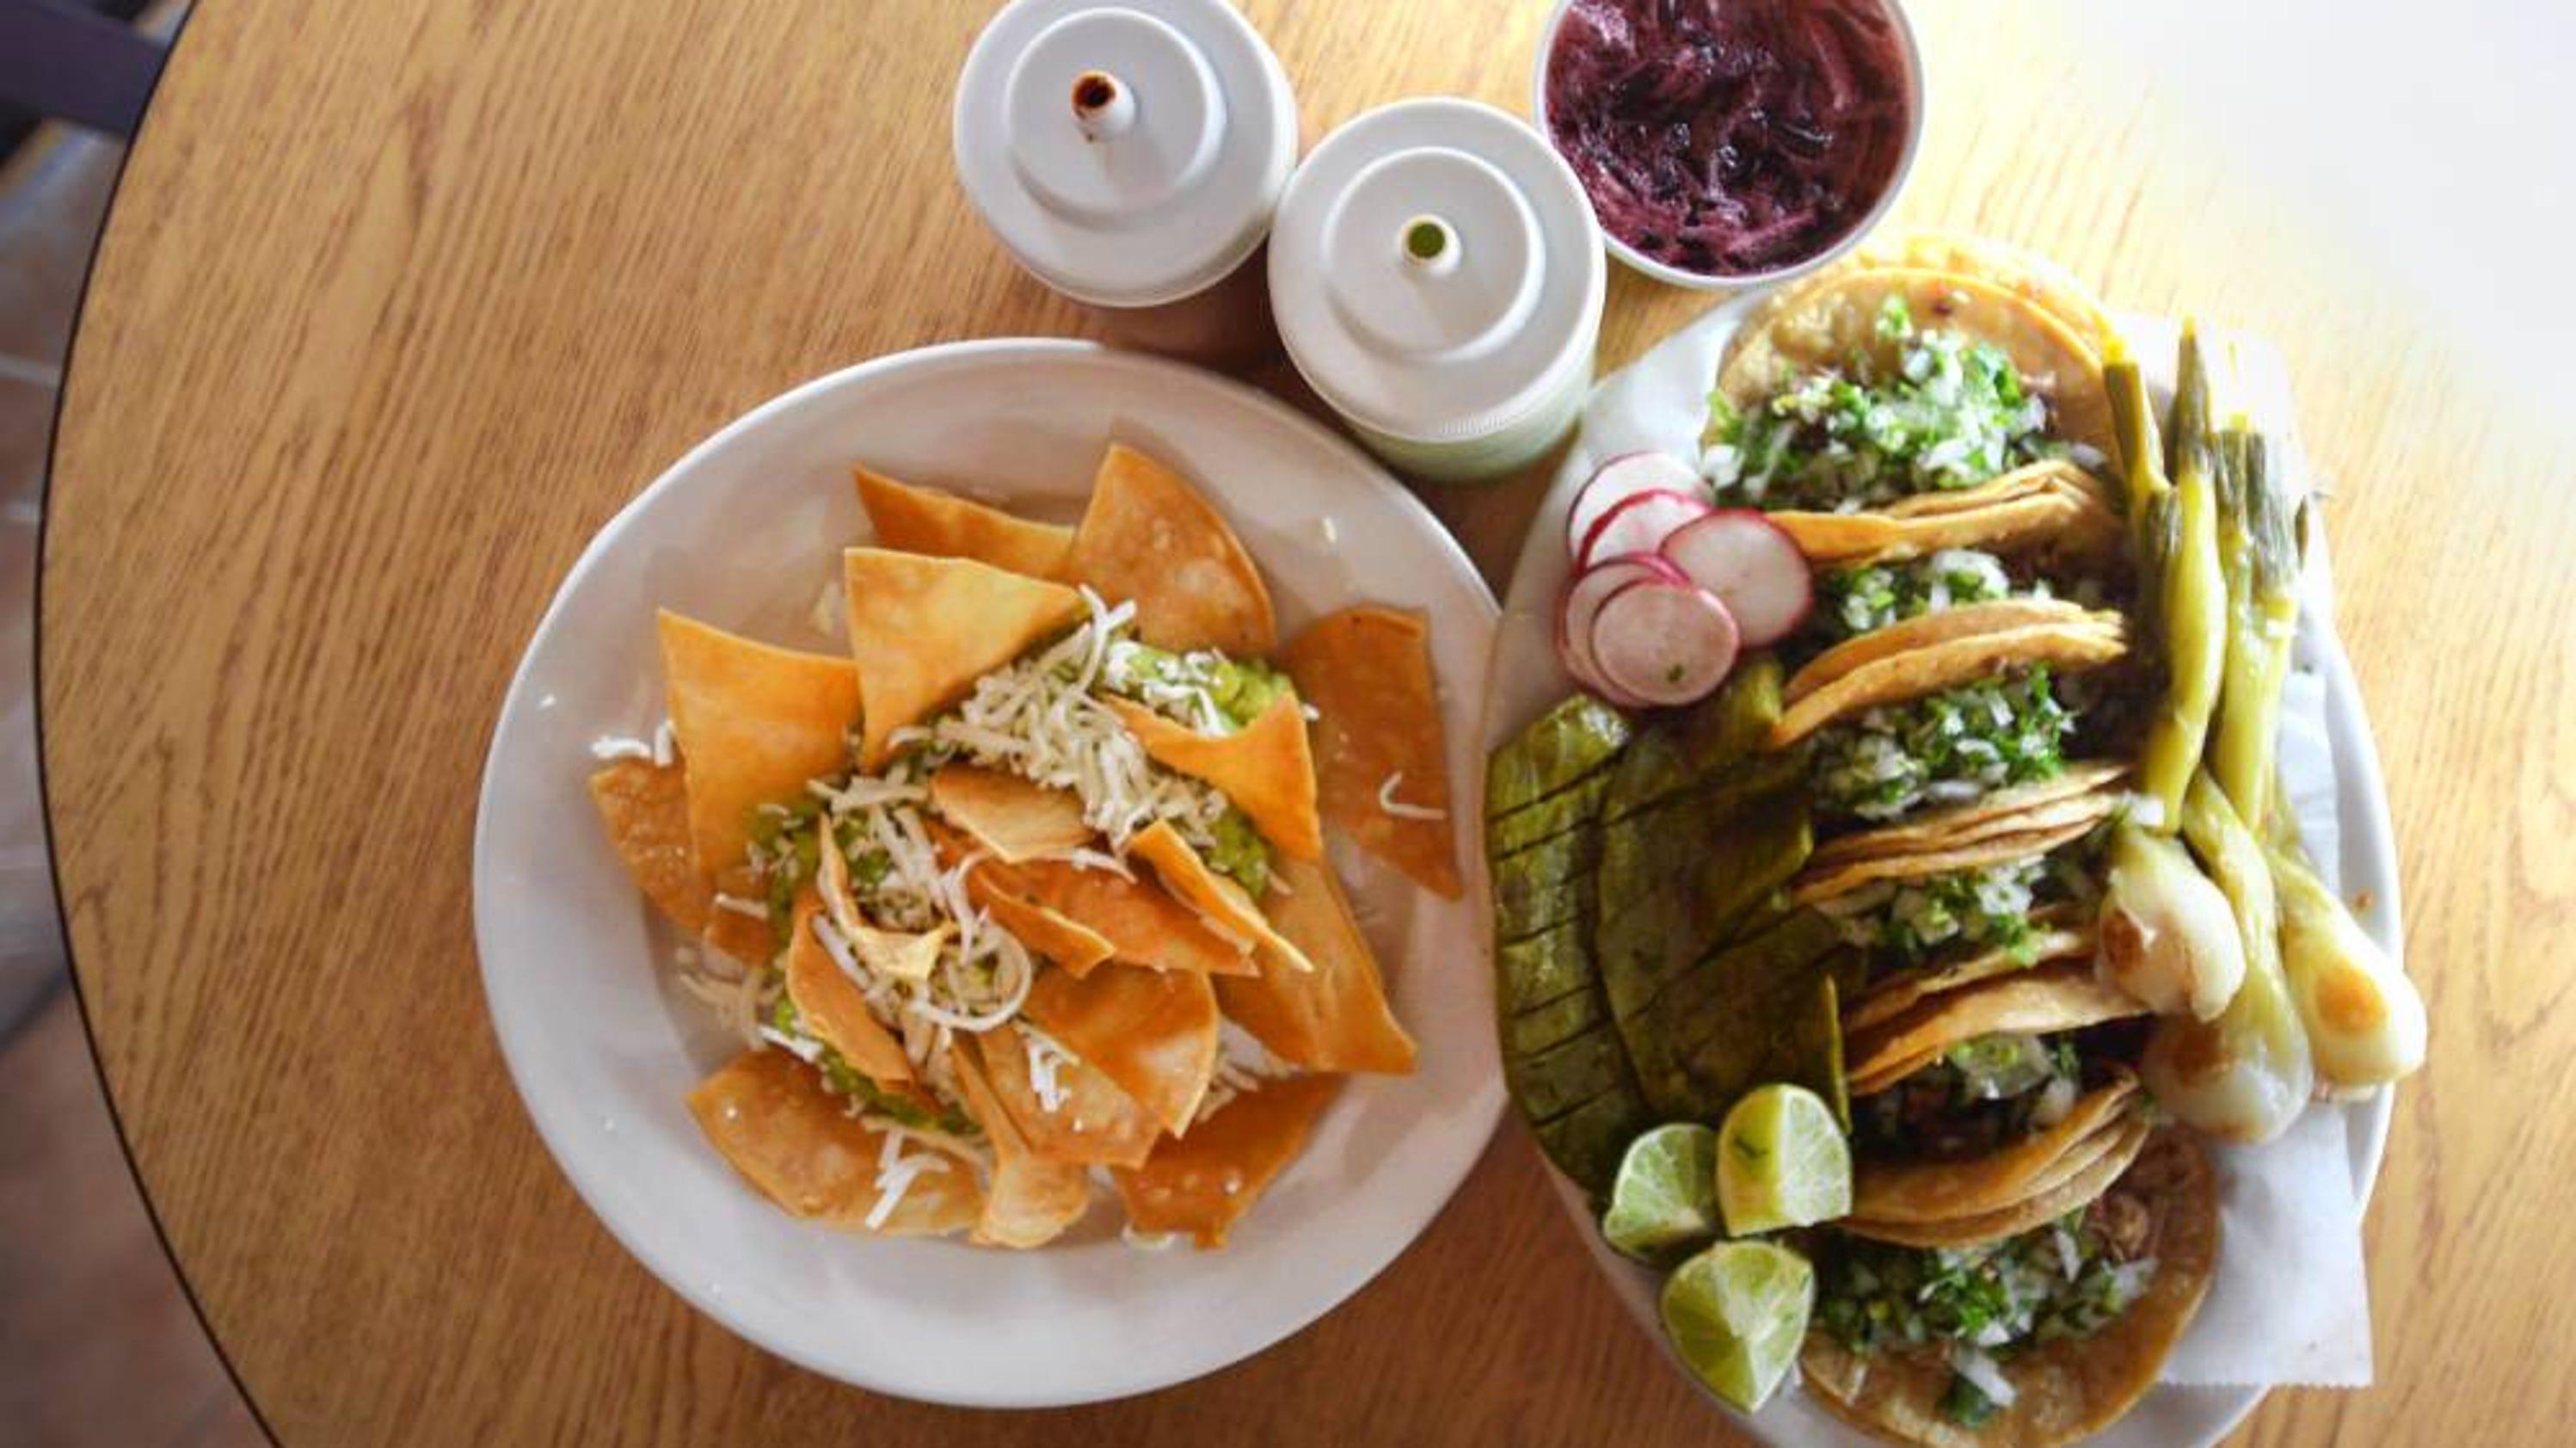 Informal dining: Mexico Deli Restaurant in Passaic